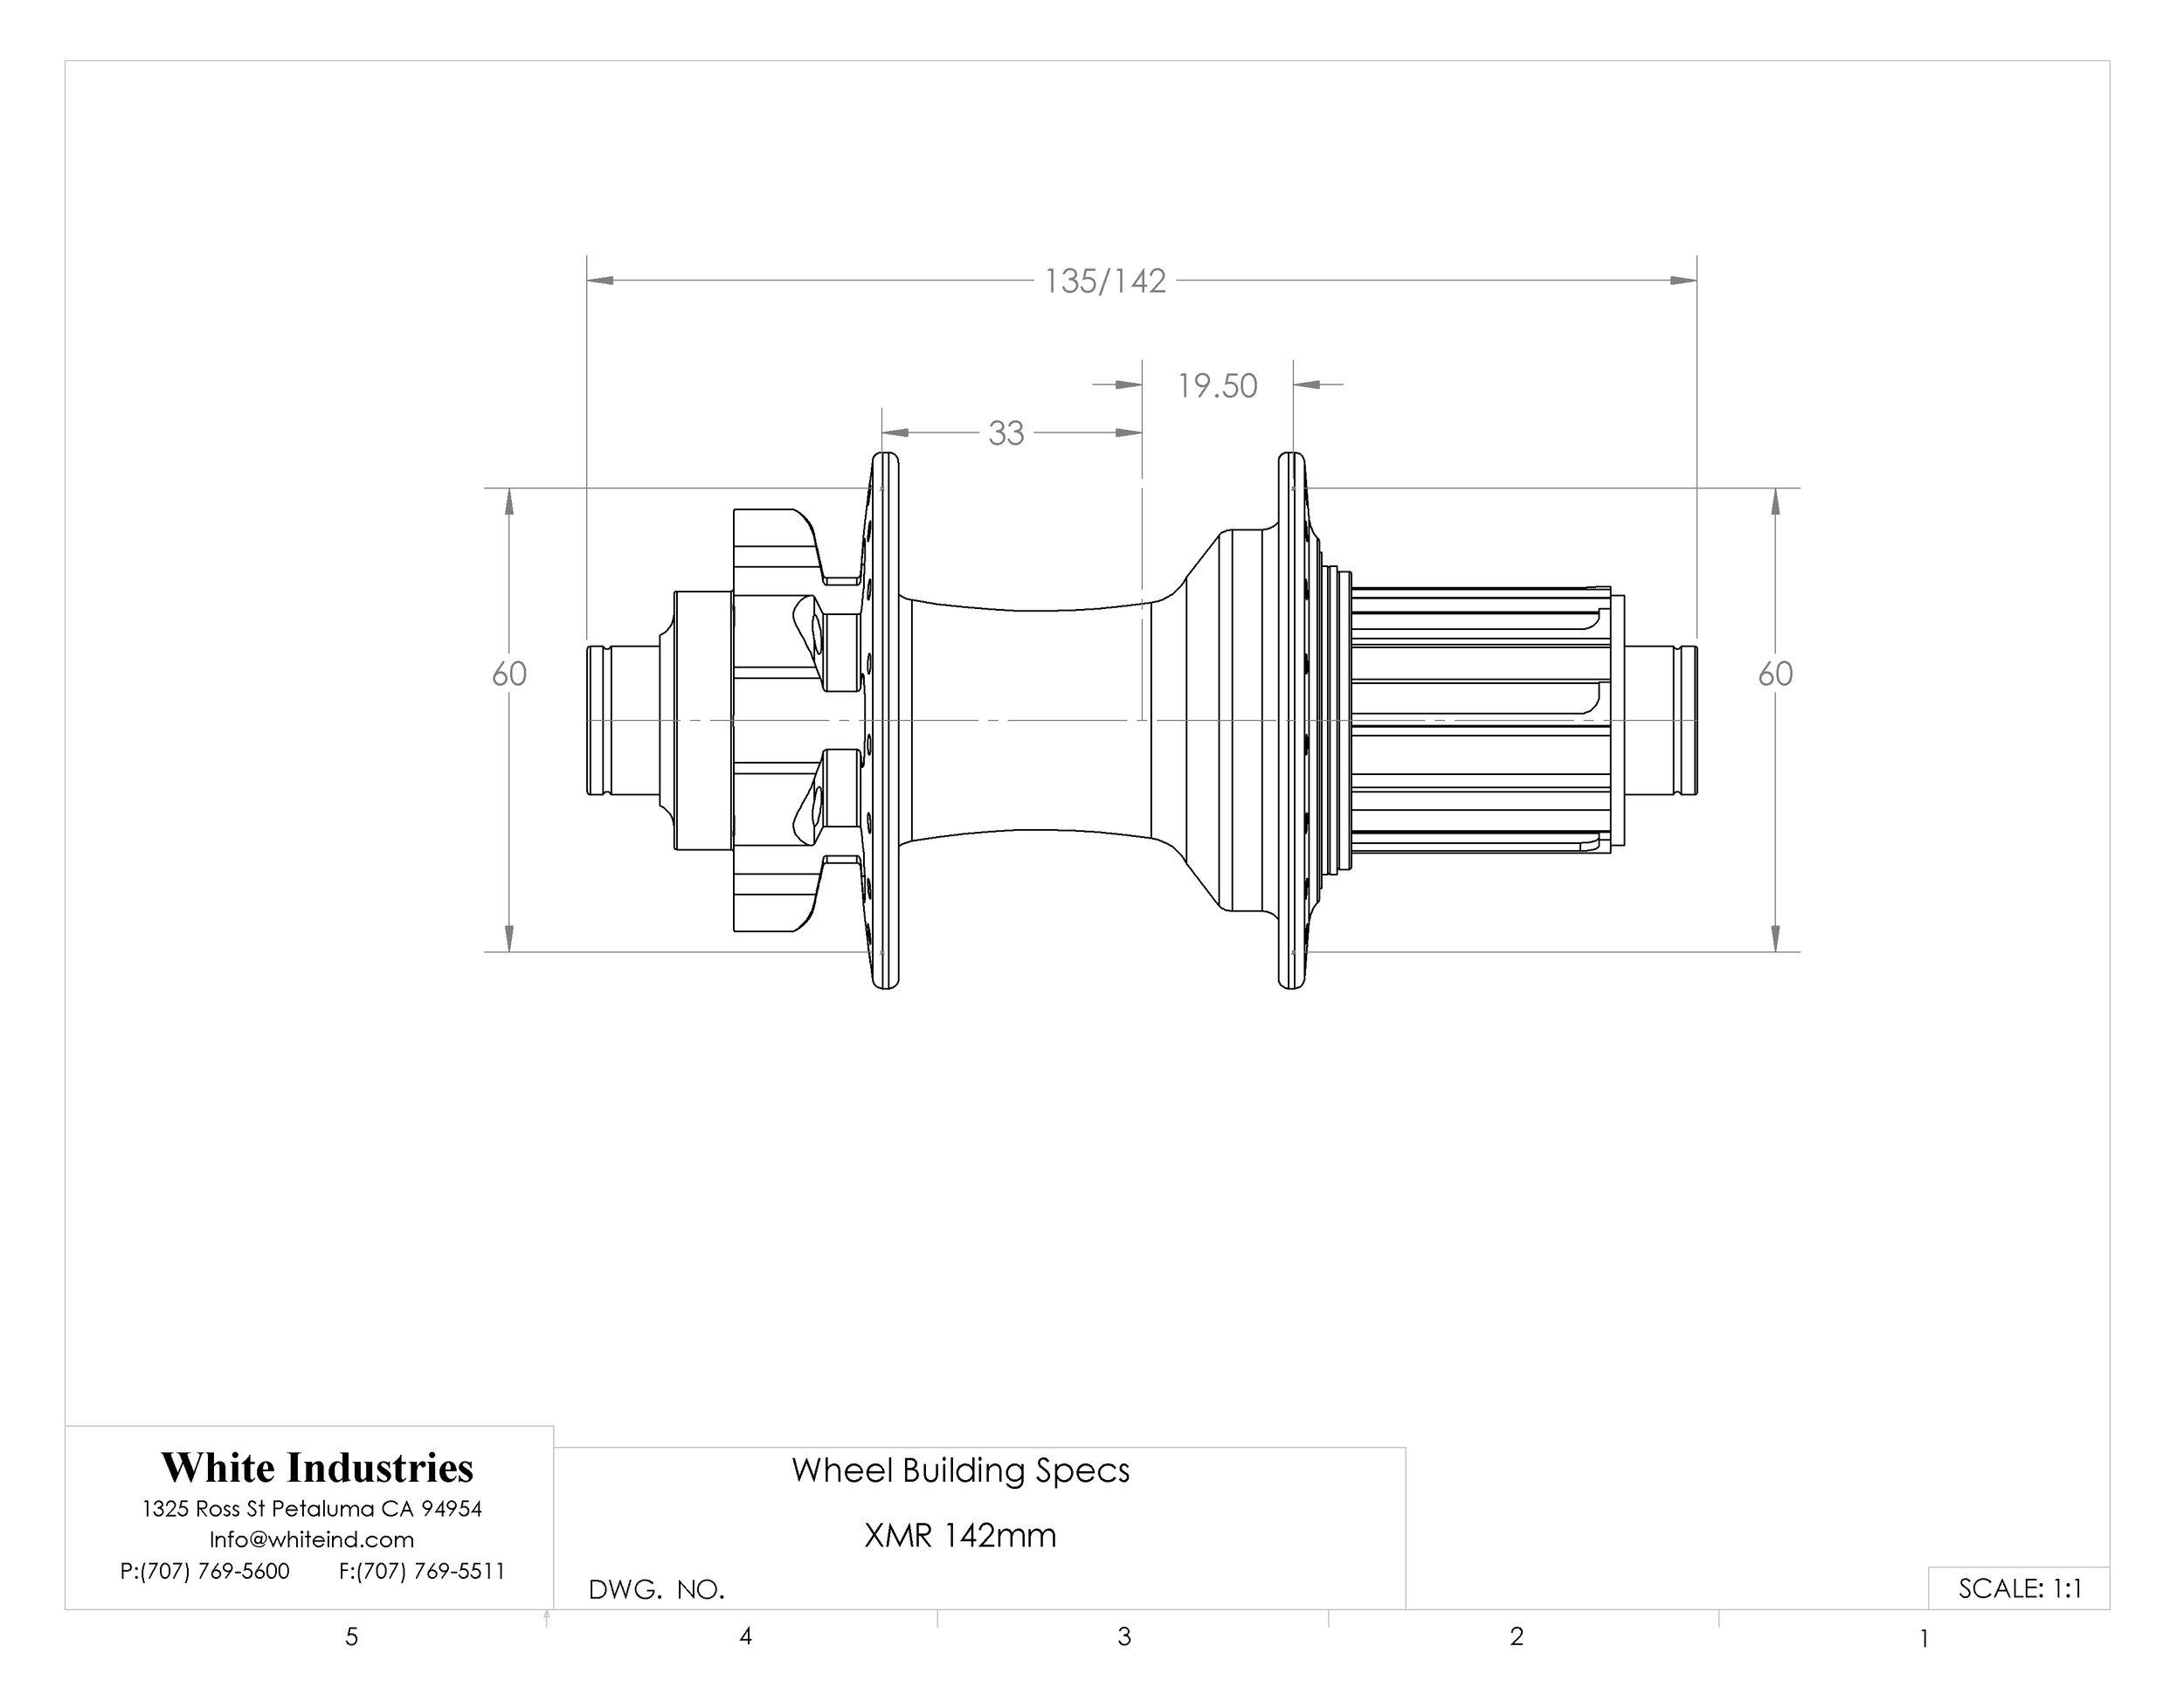 REAR XMR WHEEL BUILDING SPECS.JPG